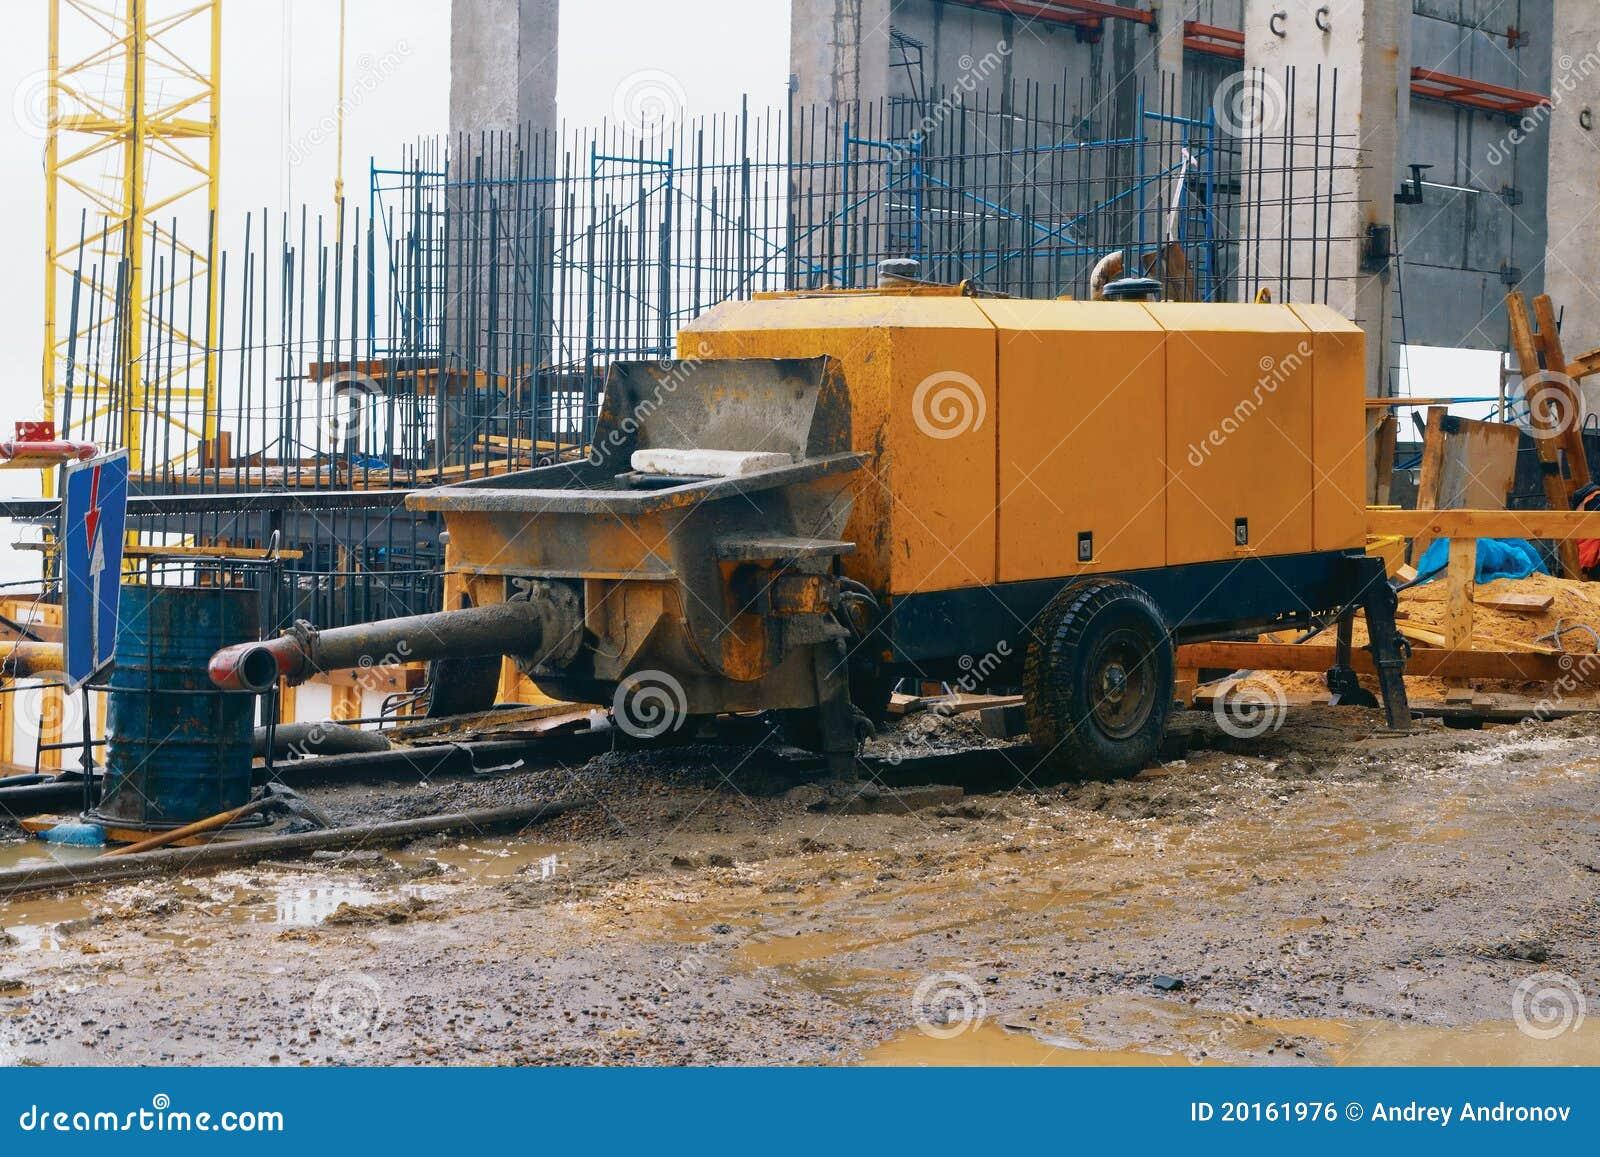 Concrete Pumping Station : Concrete pump royalty free stock image